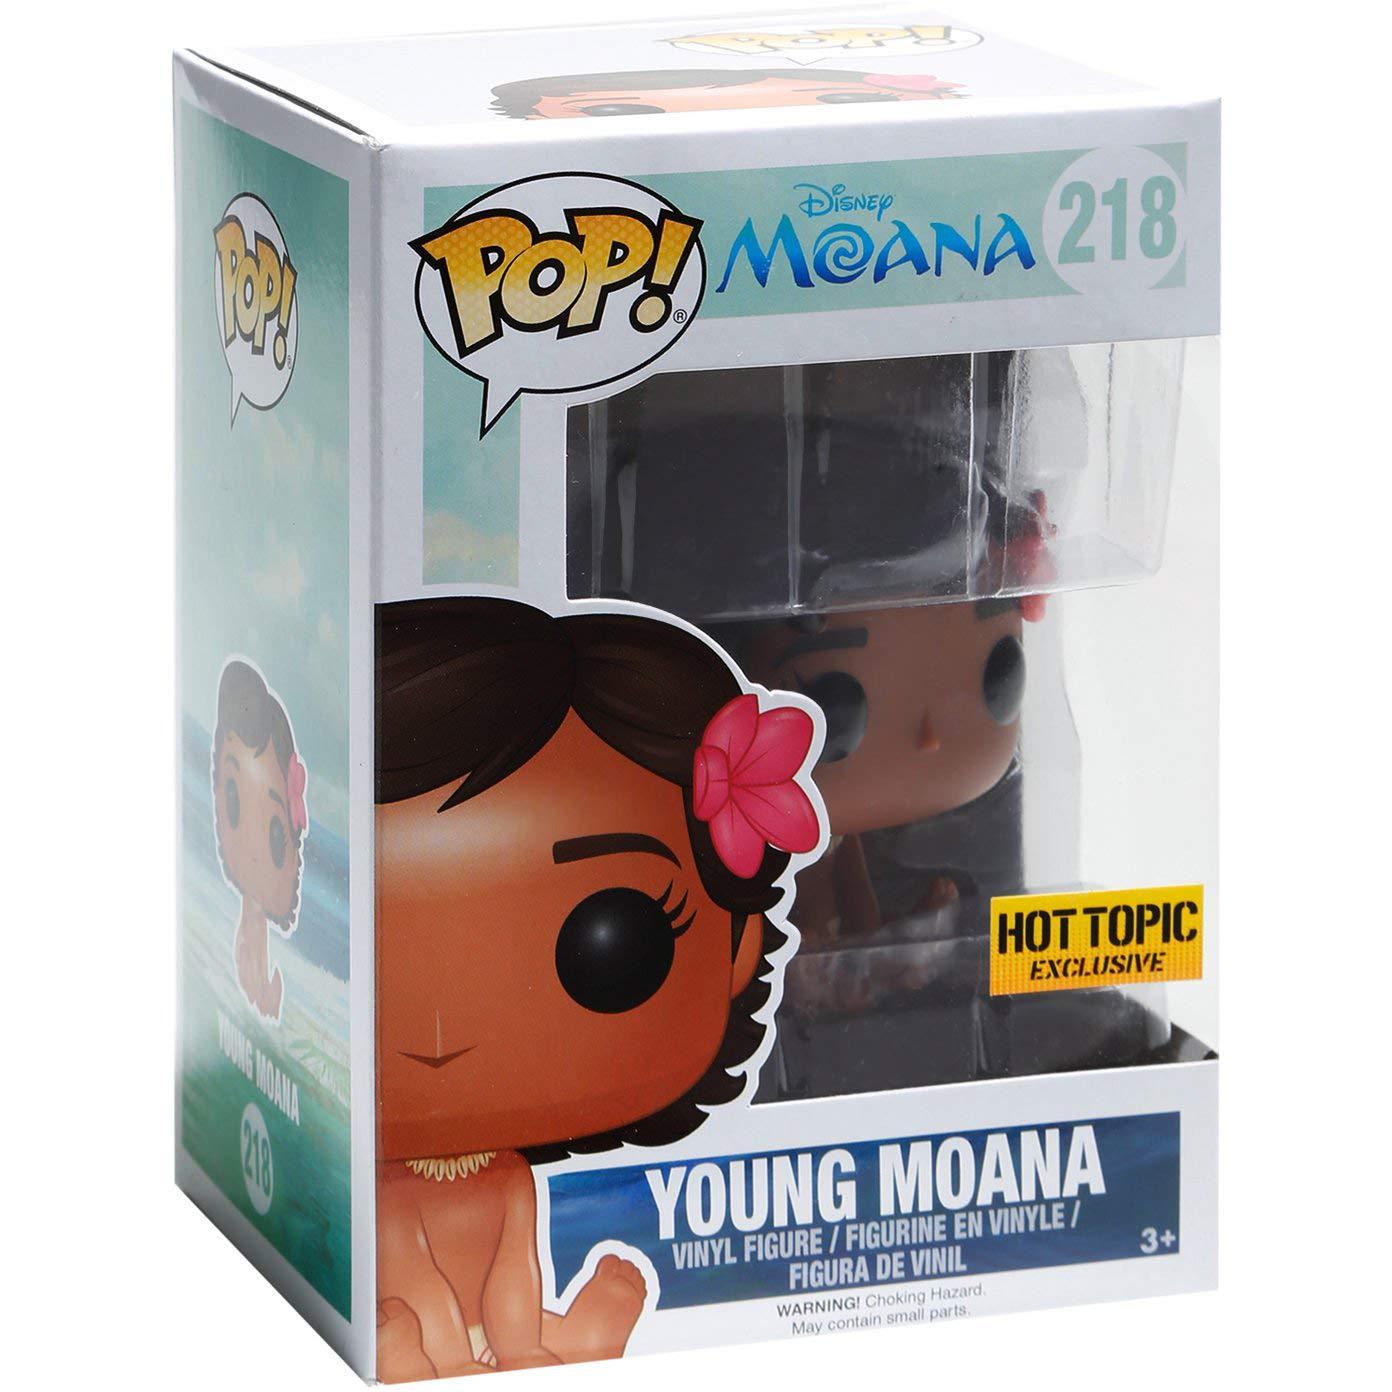 Hot Topic Exclusive #218 // 11491 - B Compatible PET Plastic Graphical Protector Bundle Funko Young Moana Disney Vinyl Figure /& 1 POP : Moana x POP